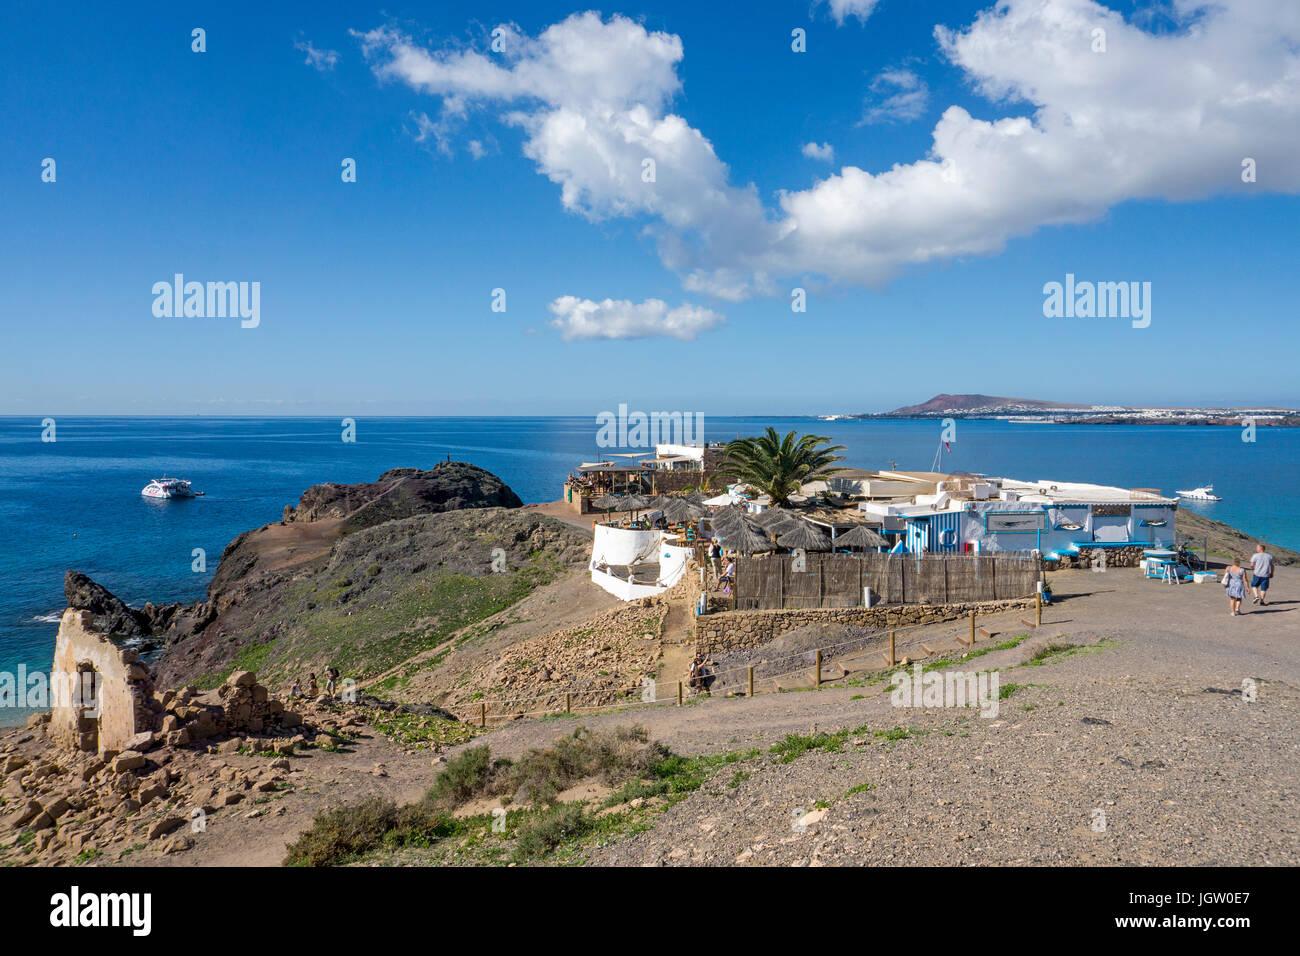 An der Playa de Papagayo, Punta Papagayo, Playa Blanca, Insel Lanzarote, Kanarische Inseln, Spanien, Europa Gastronomie Stockbild